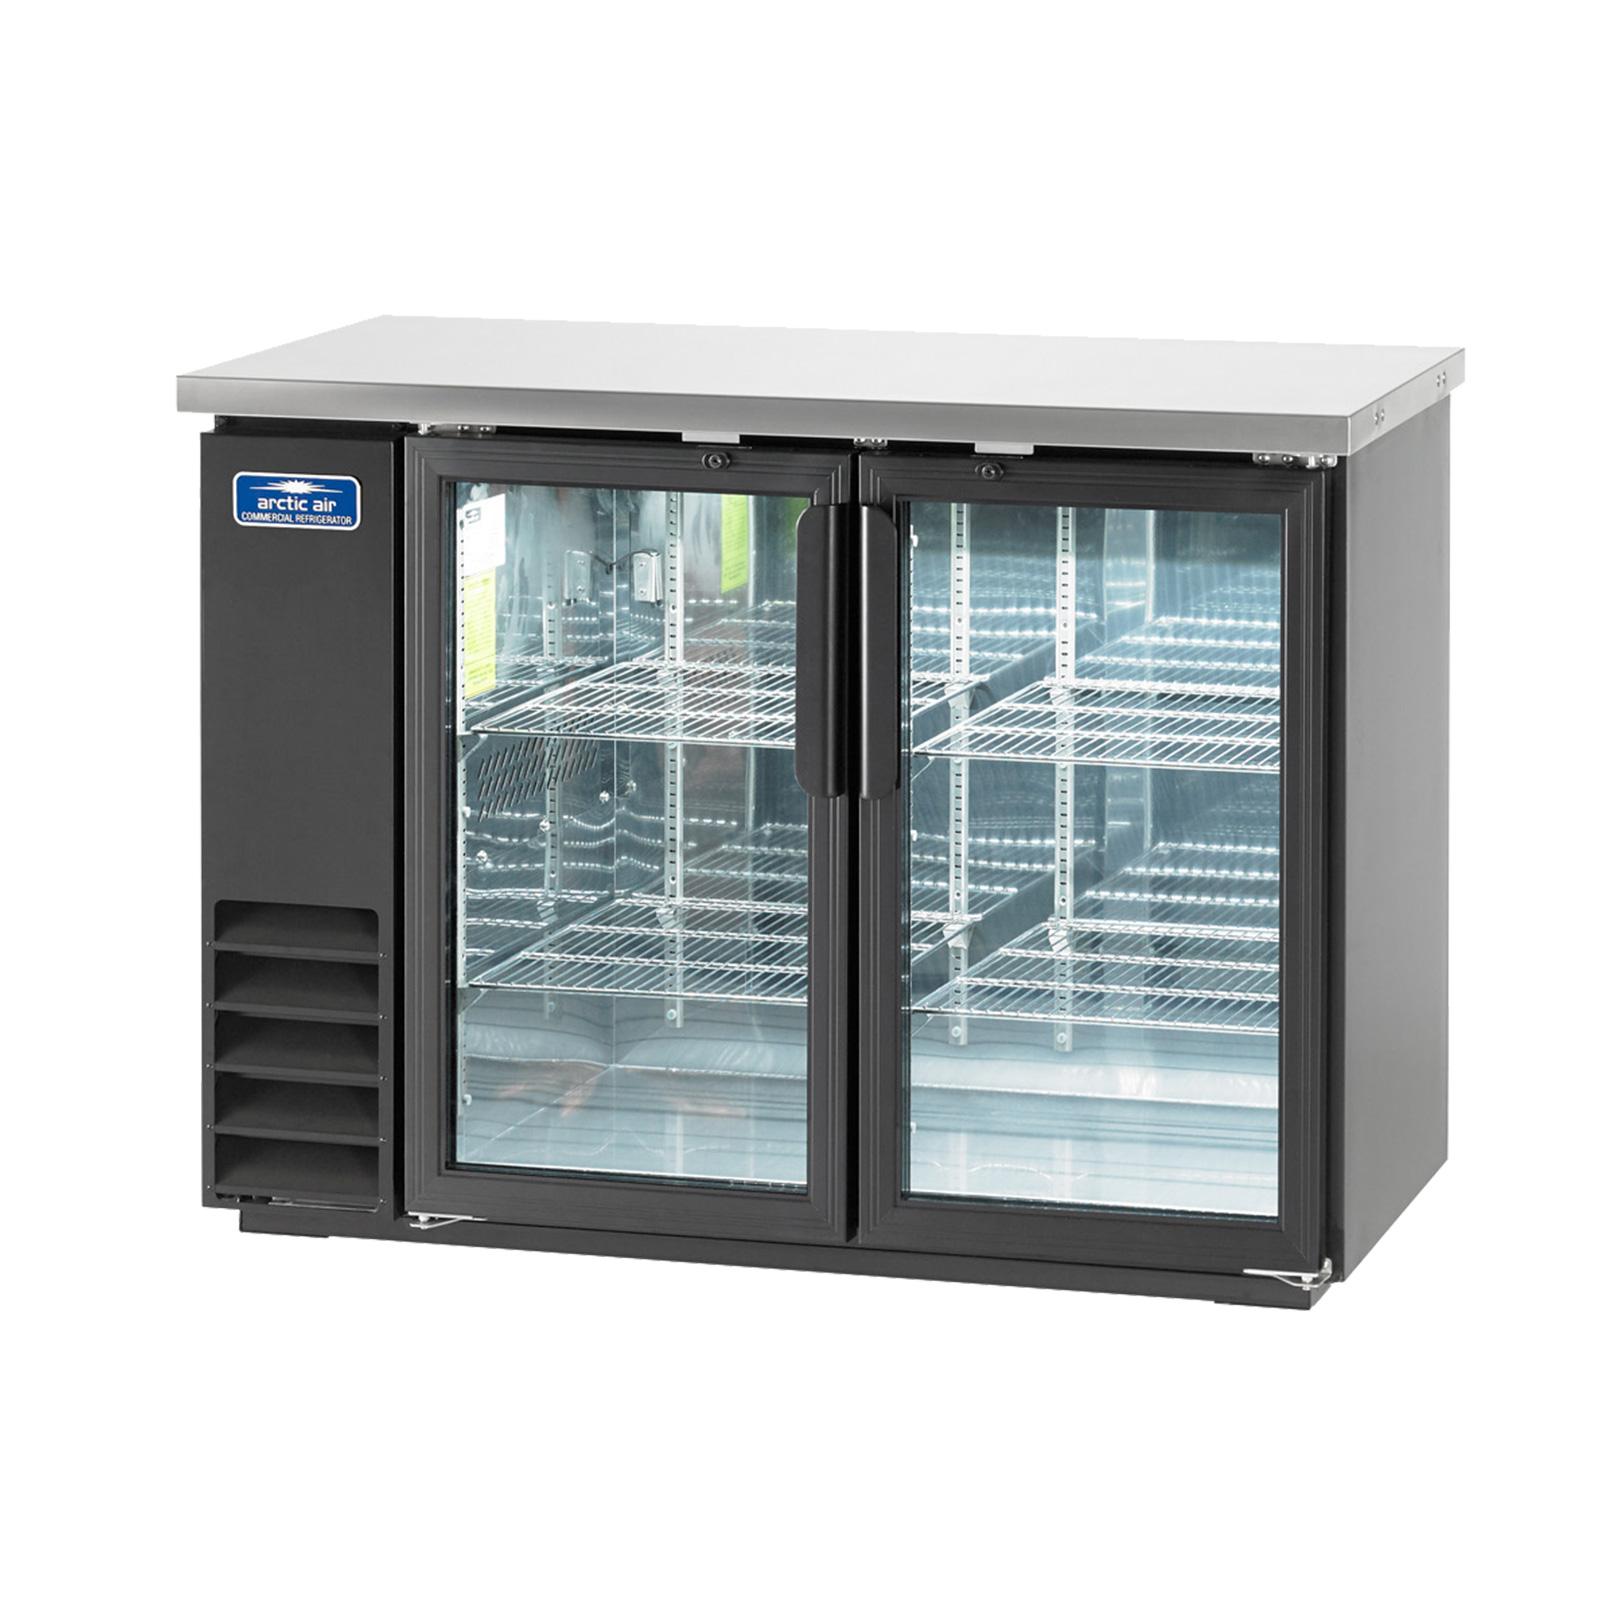 ABB48G Arctic Air Back bar cabinet, refrigerated